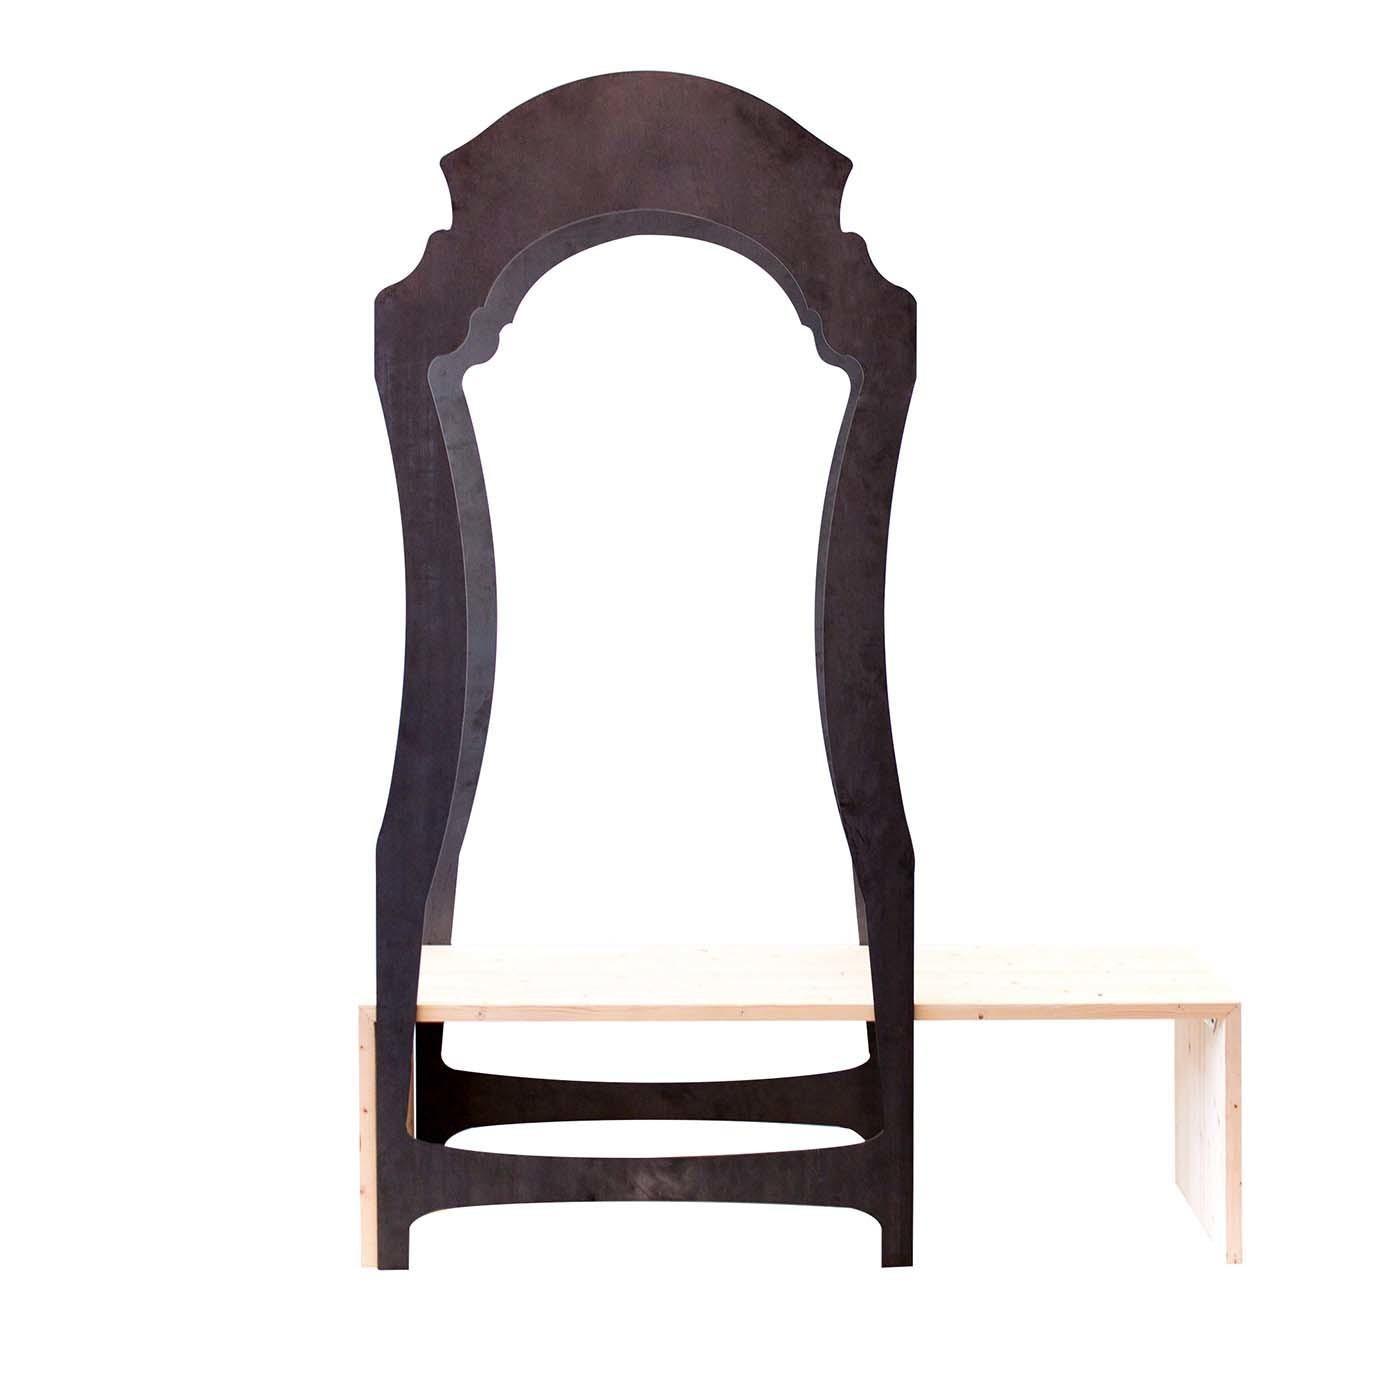 Segno Wardrobe with Bench #2 by Flore & Venezia